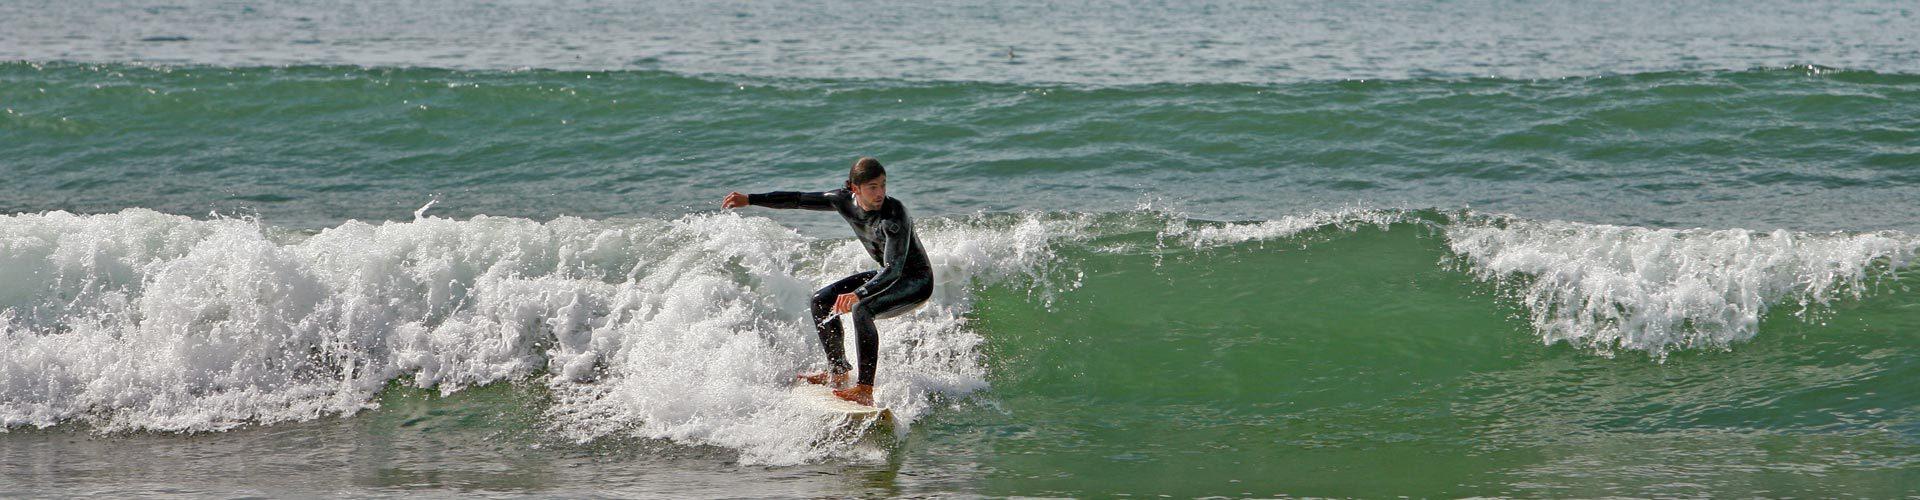 Surfer in Los Angeles, Kalifornien